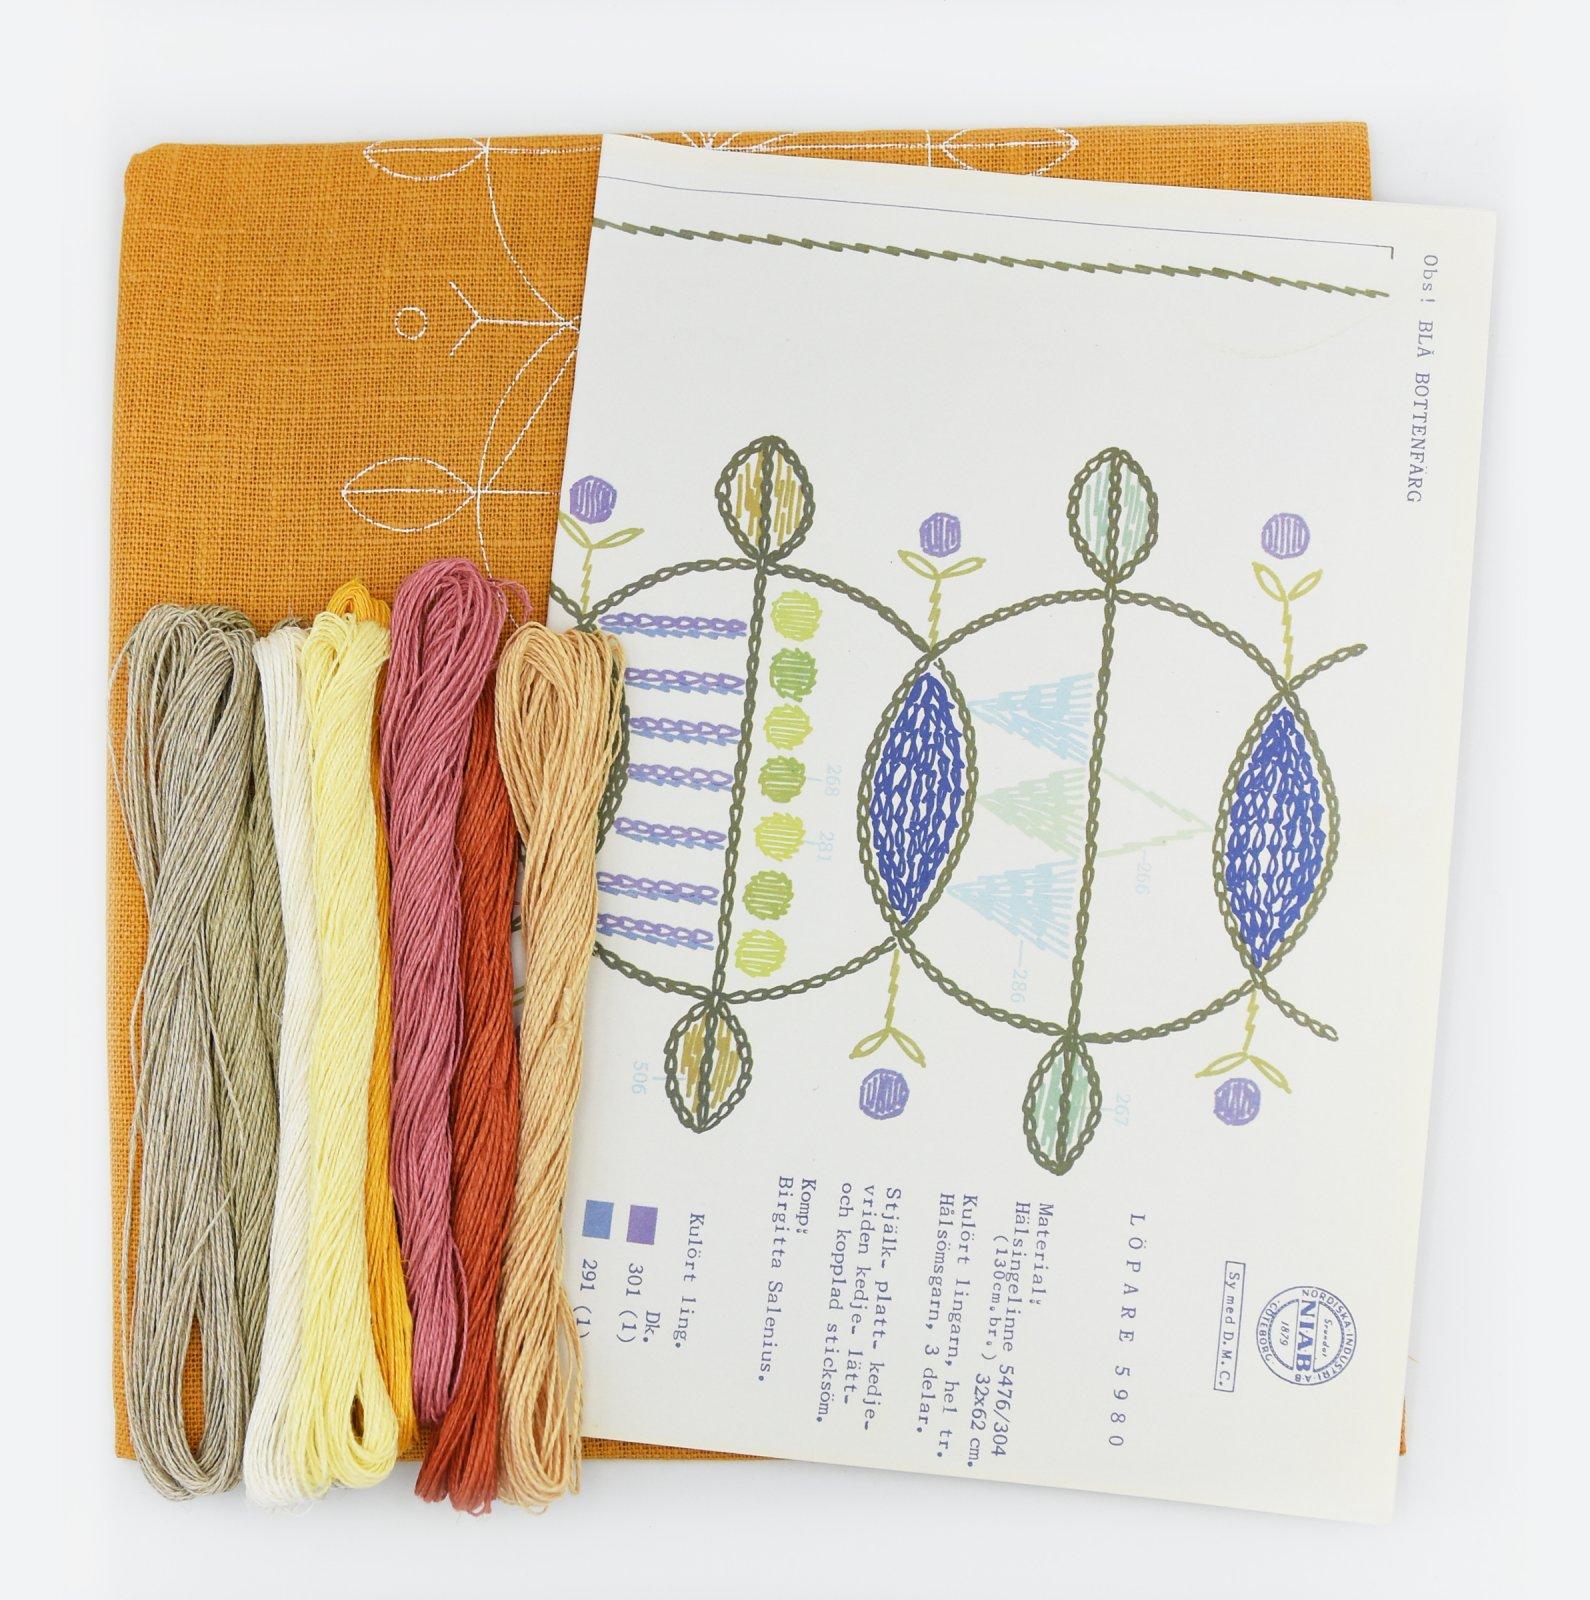 Linladan - Mustard Circle Runner - Nordiska print with linen threads